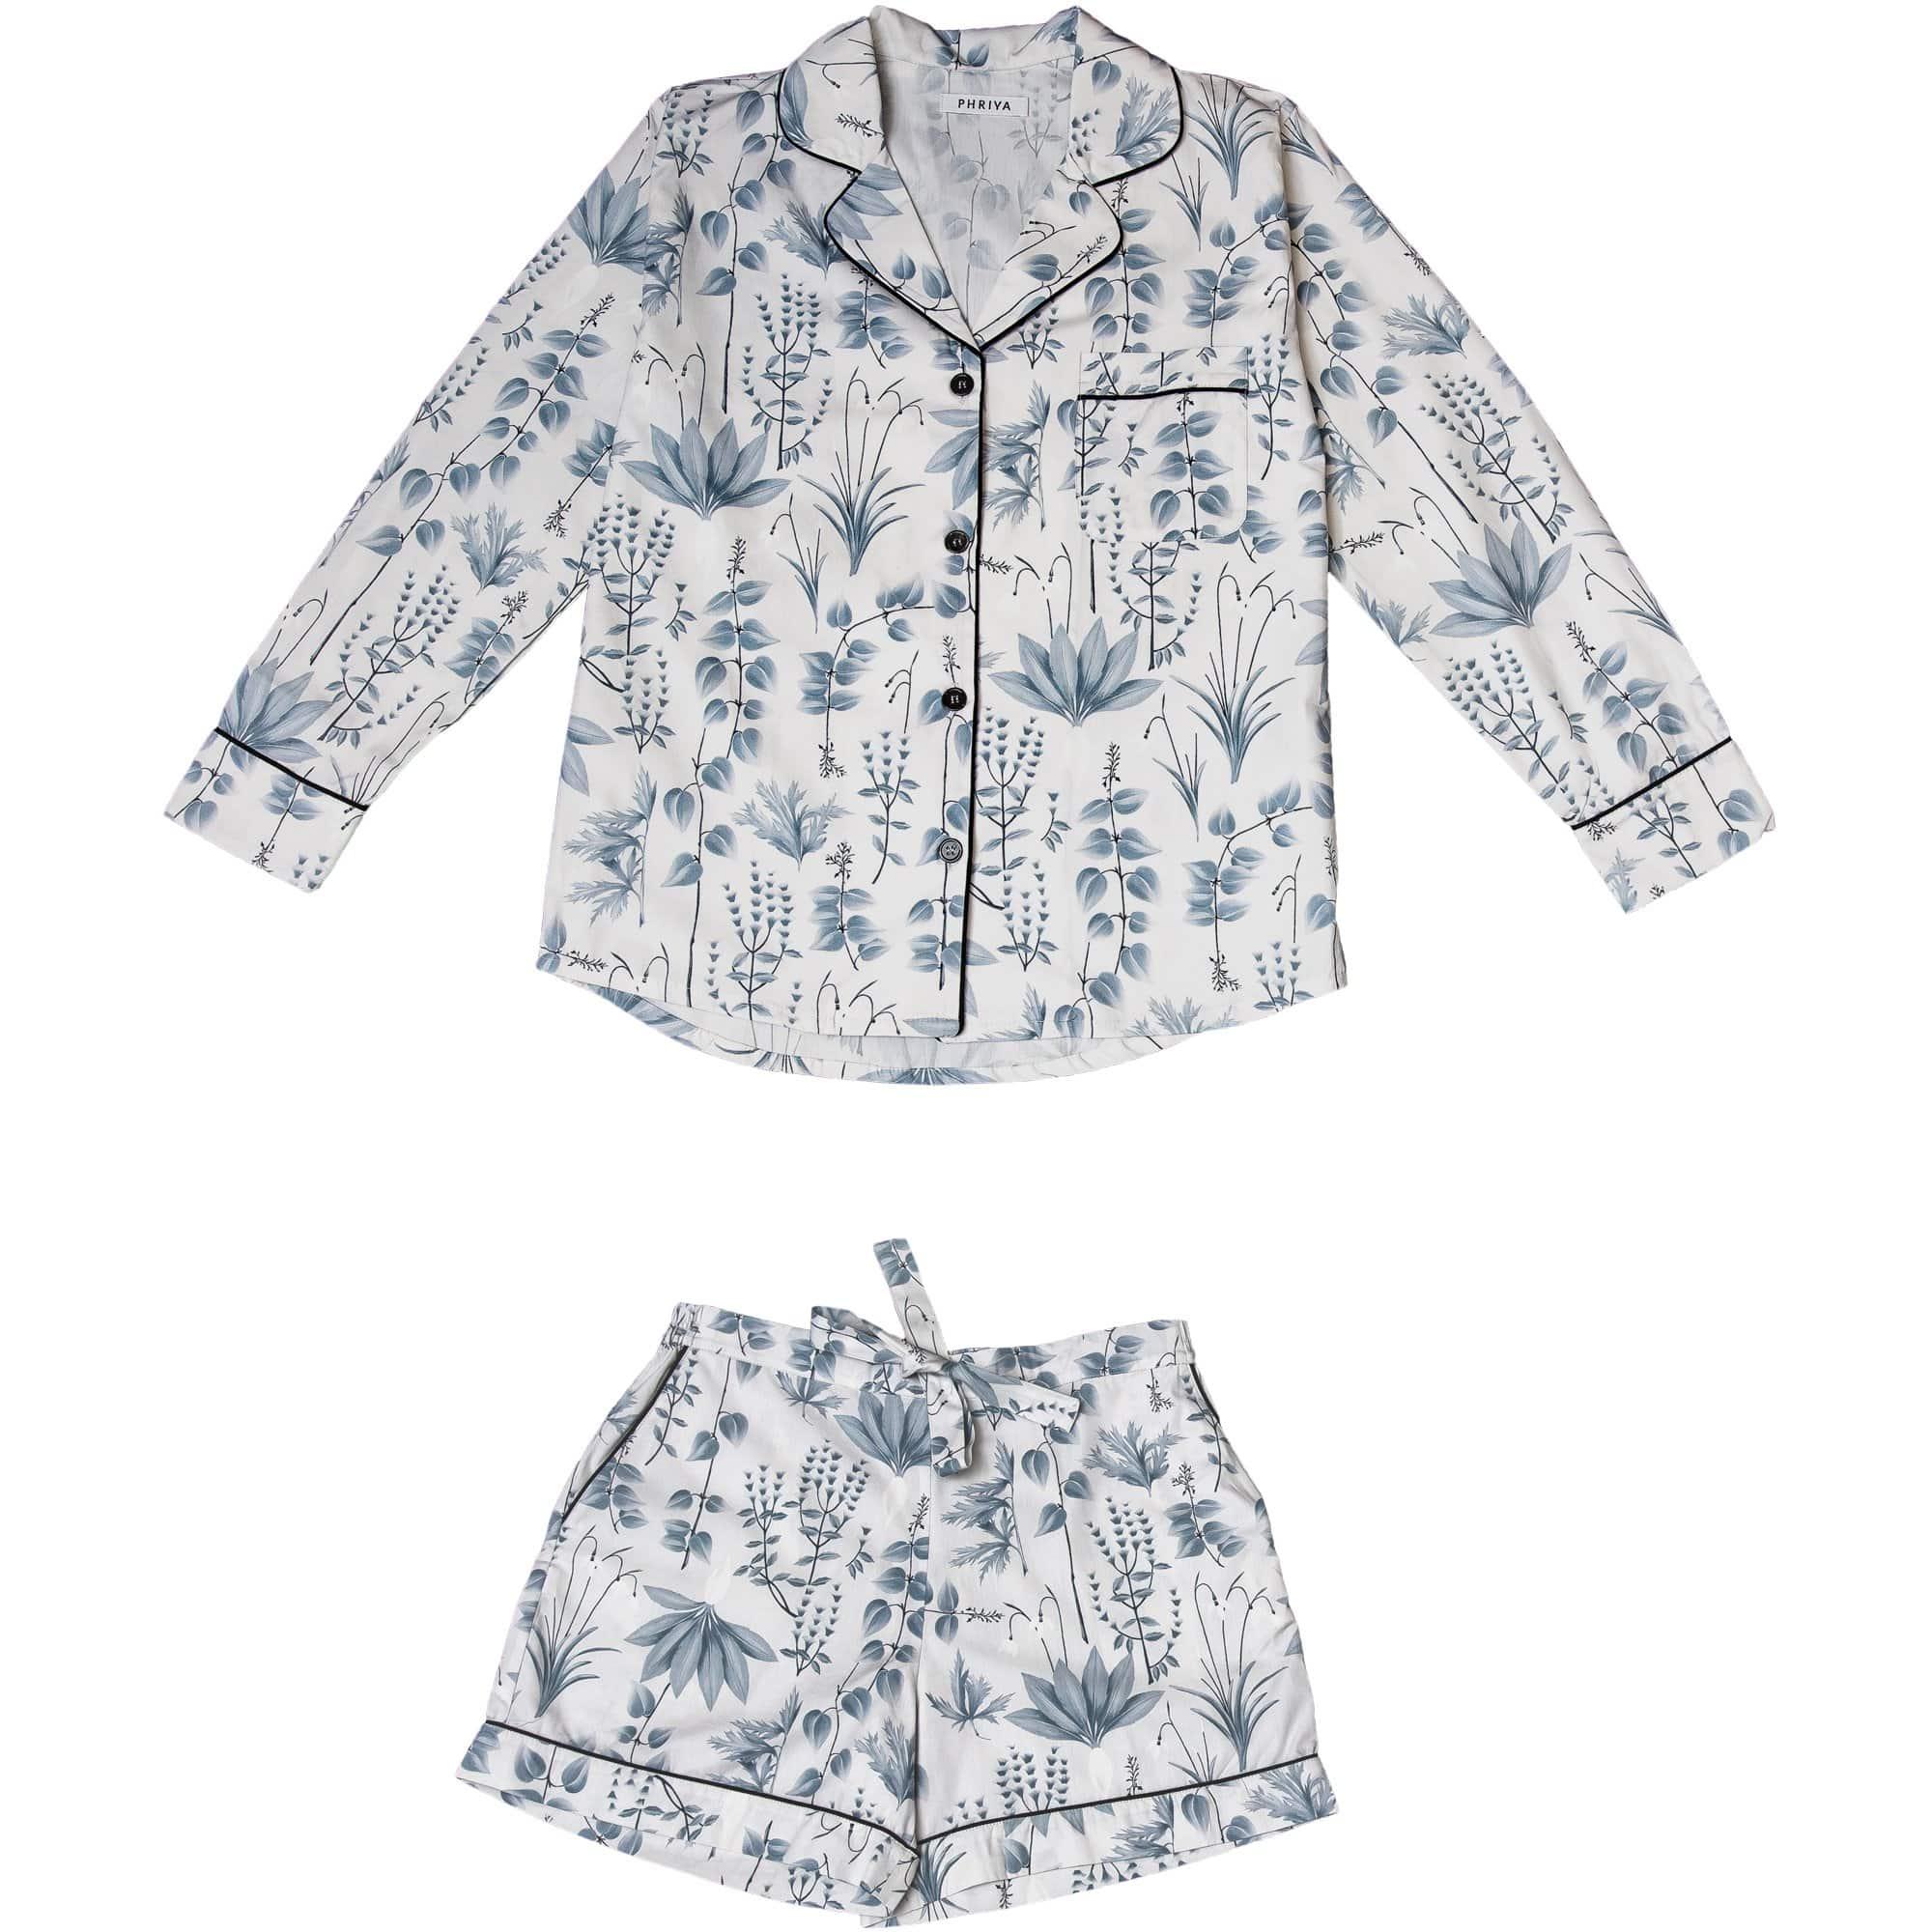 Phriya Women's Gray Circe's Garden Pajama Set With Shorts  - multicolor - Size: One Size